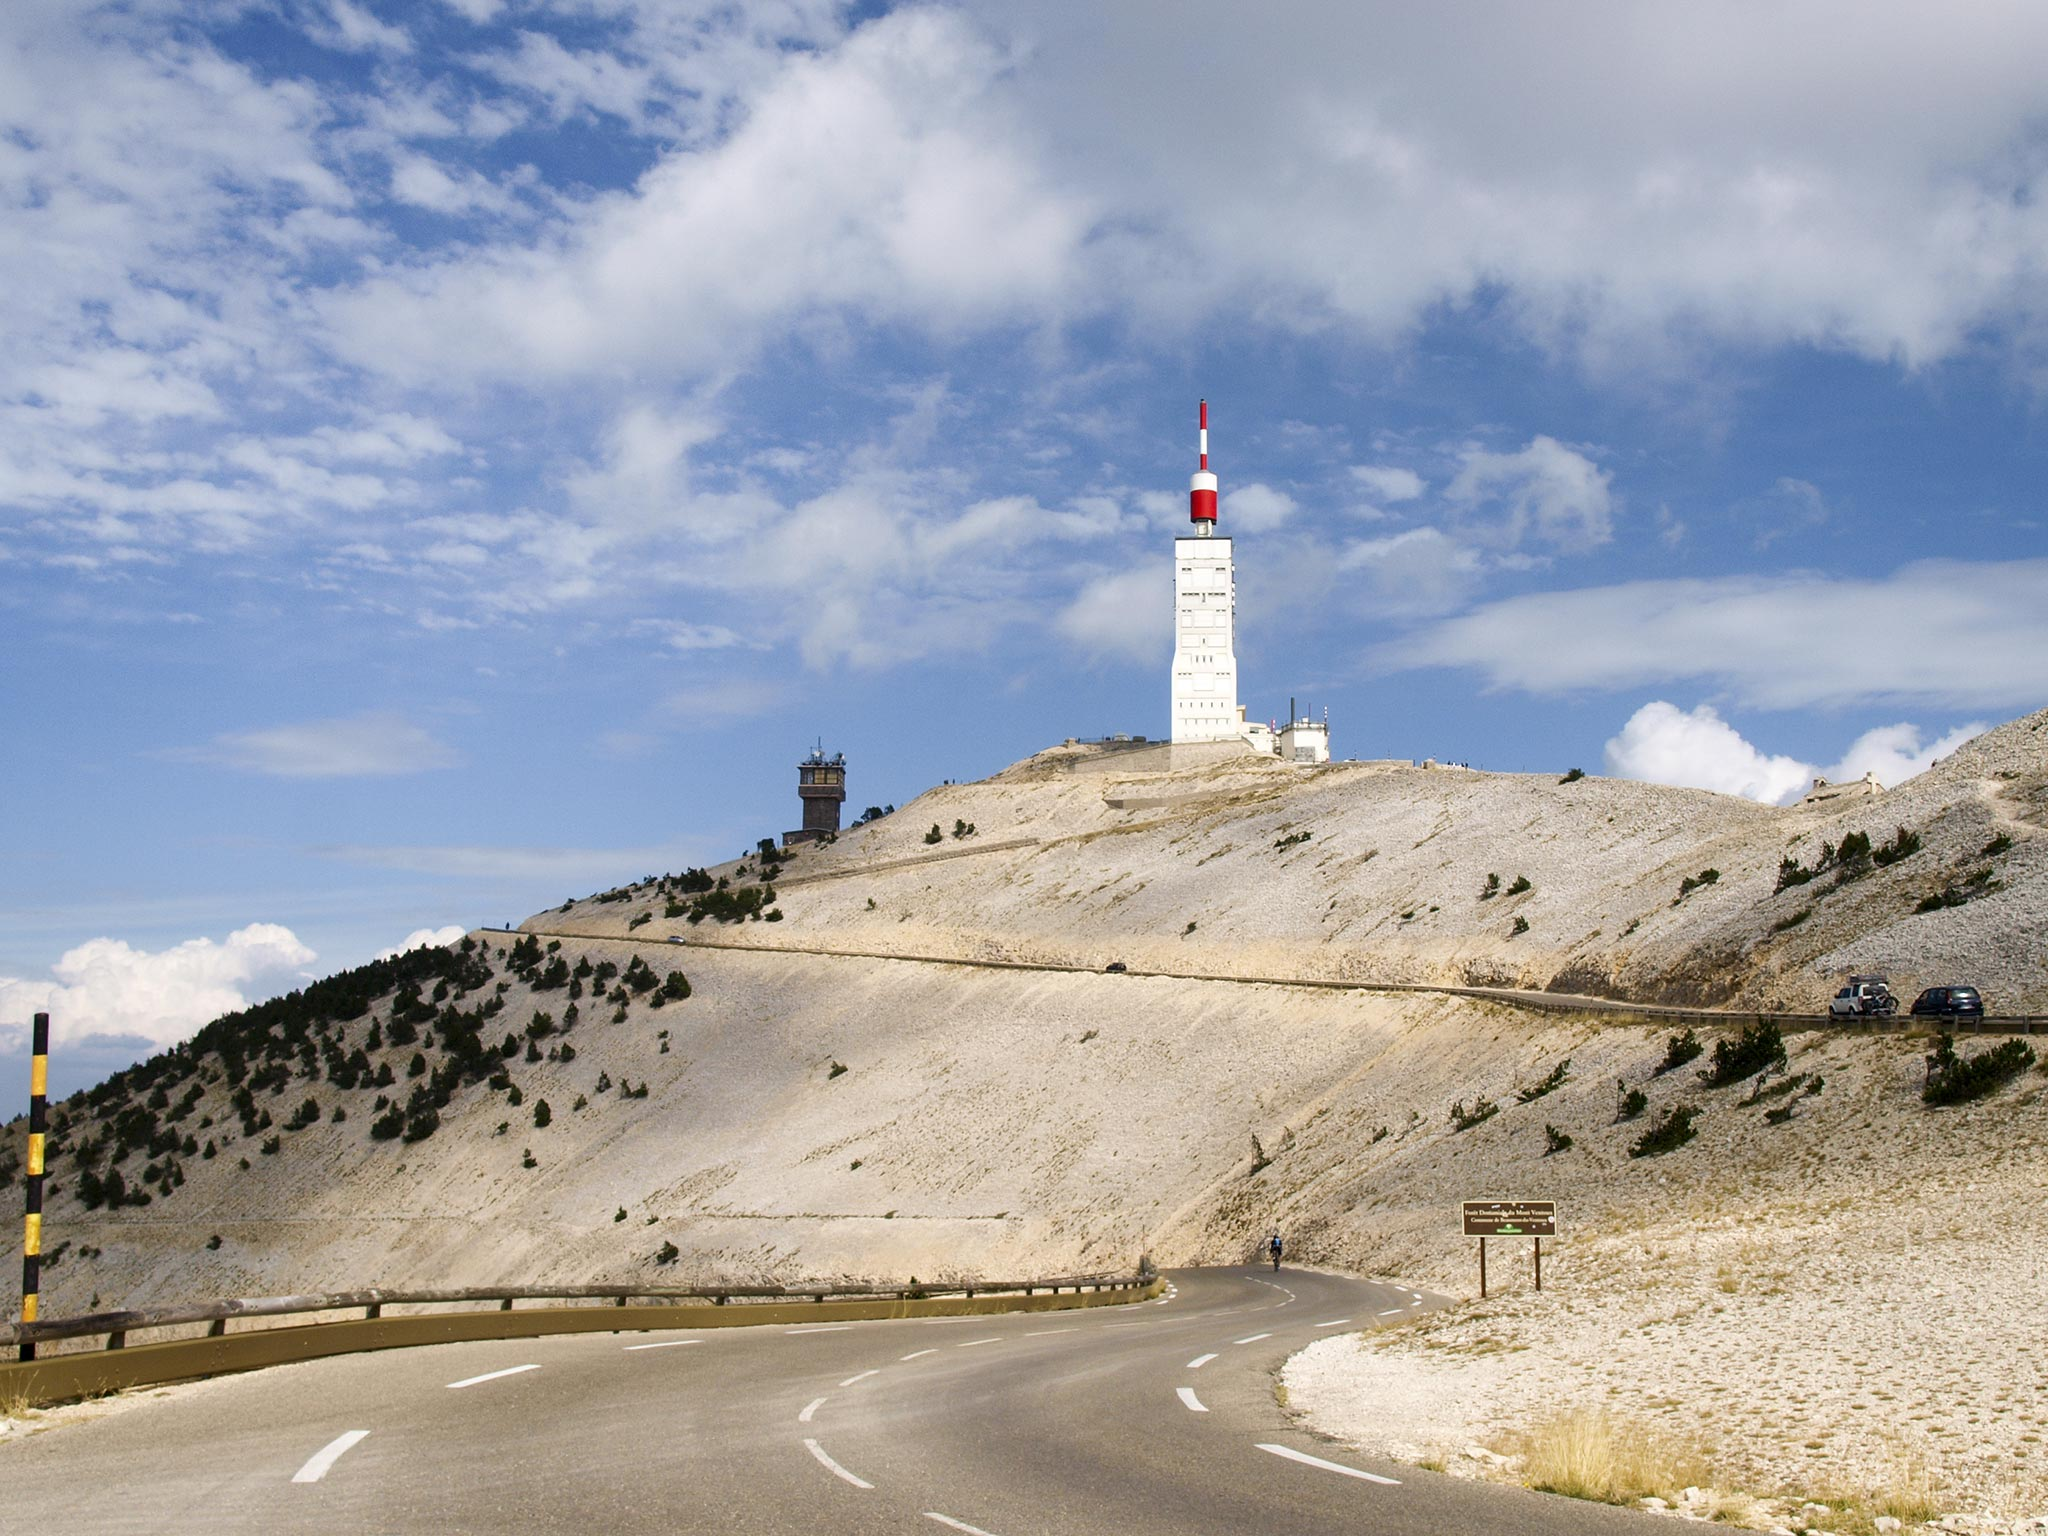 Mont Ventoux © Shutterstock